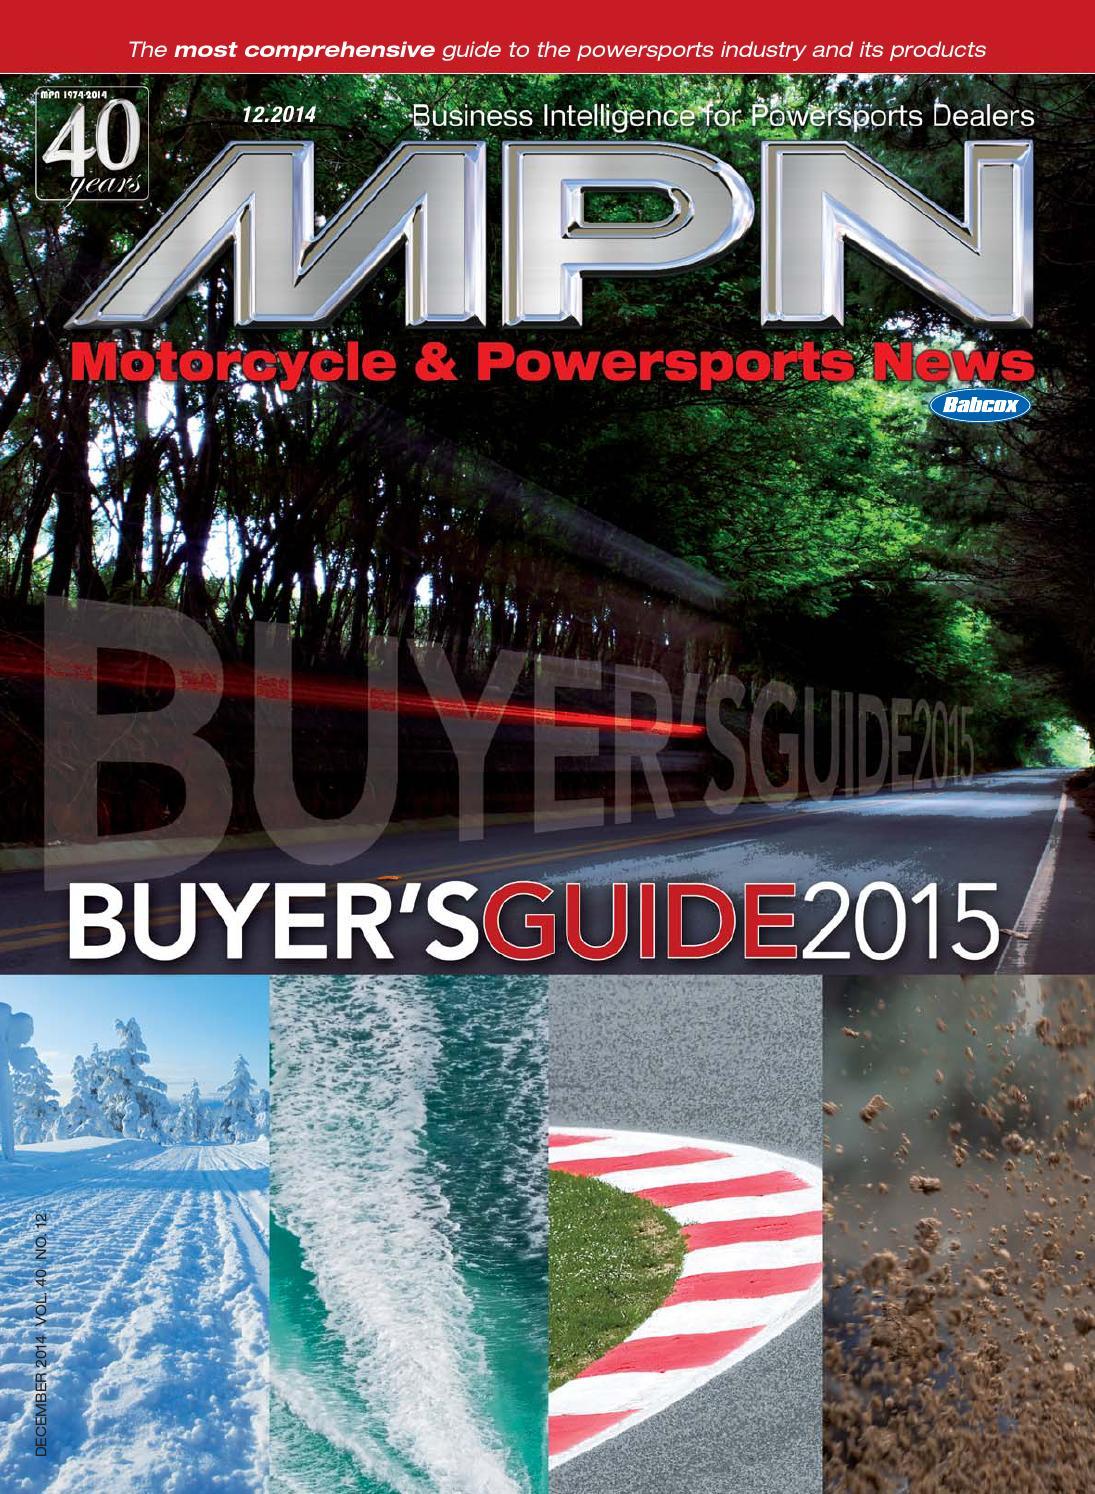 b3e9bca60 Motorcycle & Powersports News, December 2014 by Babcox Media - issuu